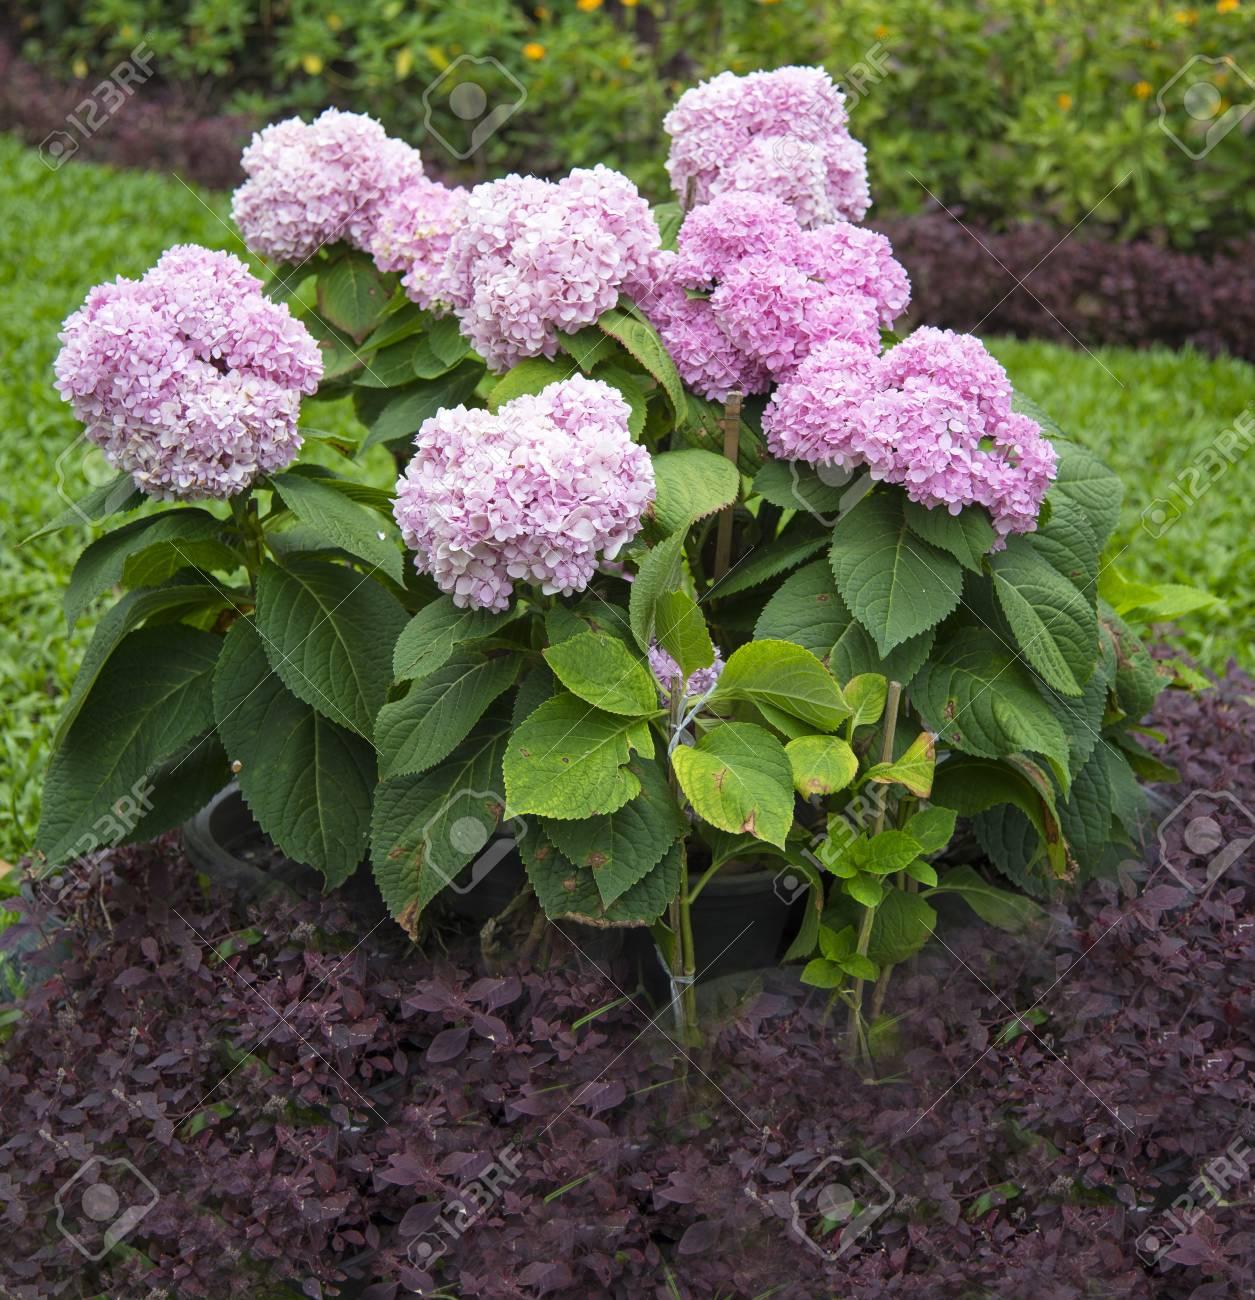 Pink Hydrangeas Hydrangea Macrophylla In A Garden Stock Photo